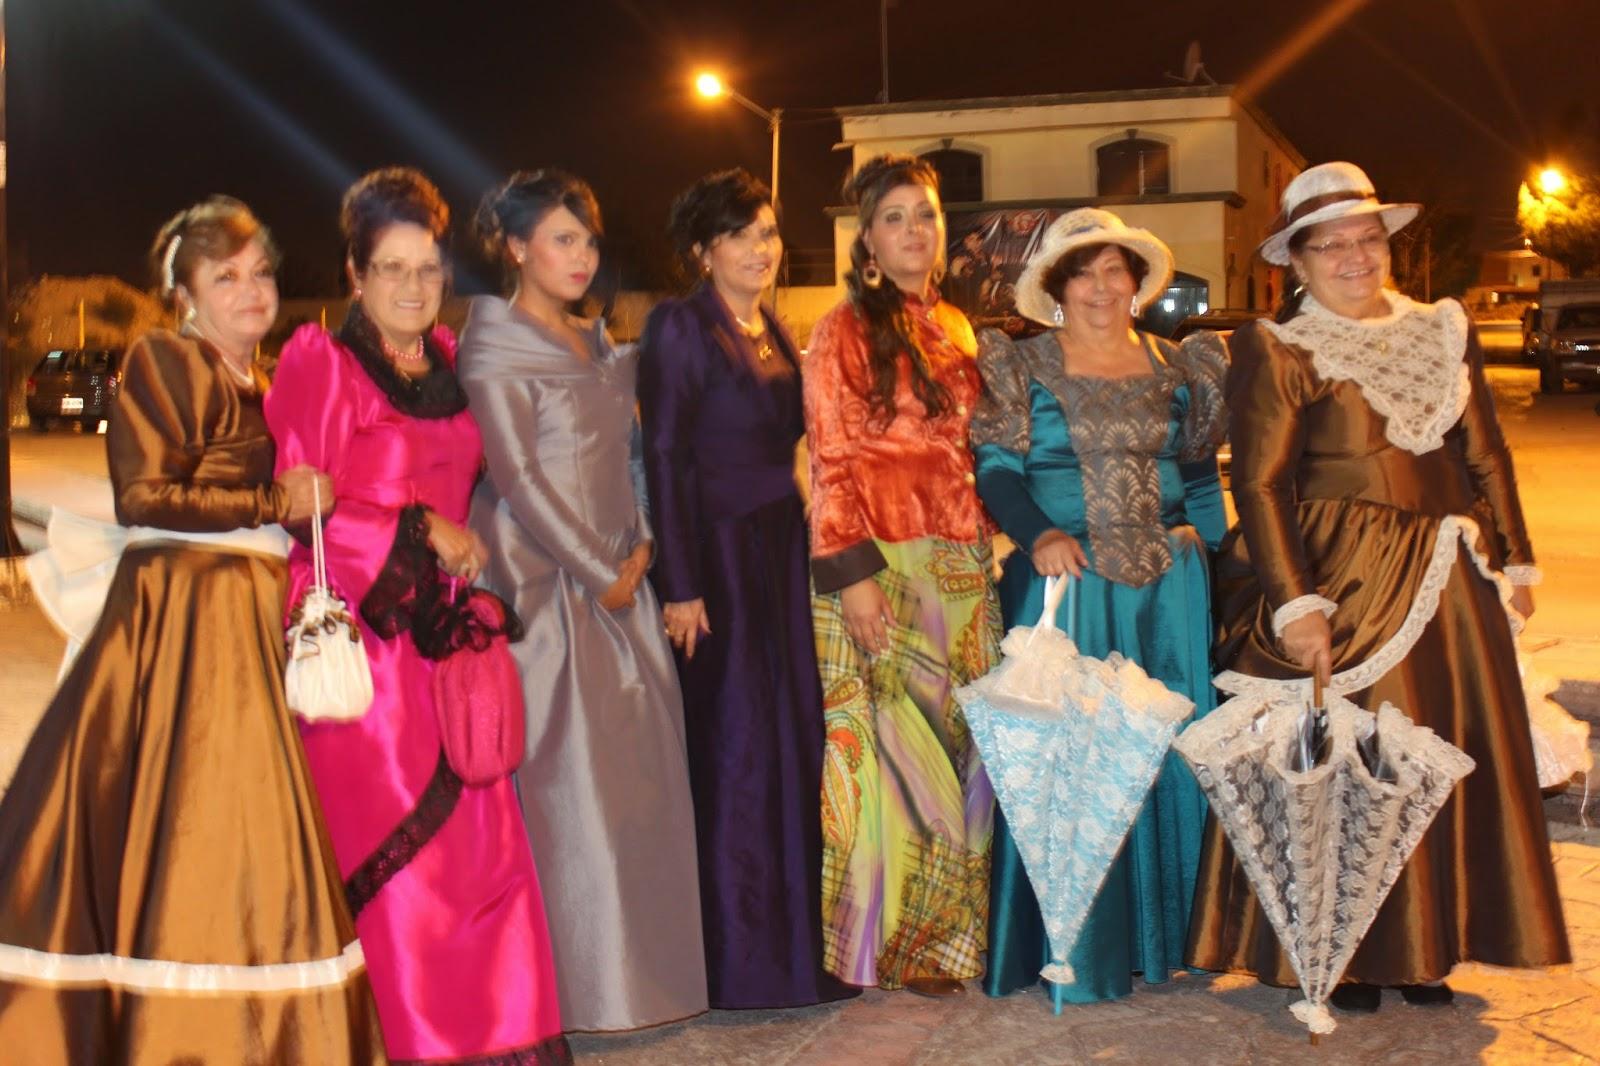 Vestidos 50o aniversario de boda para la familia